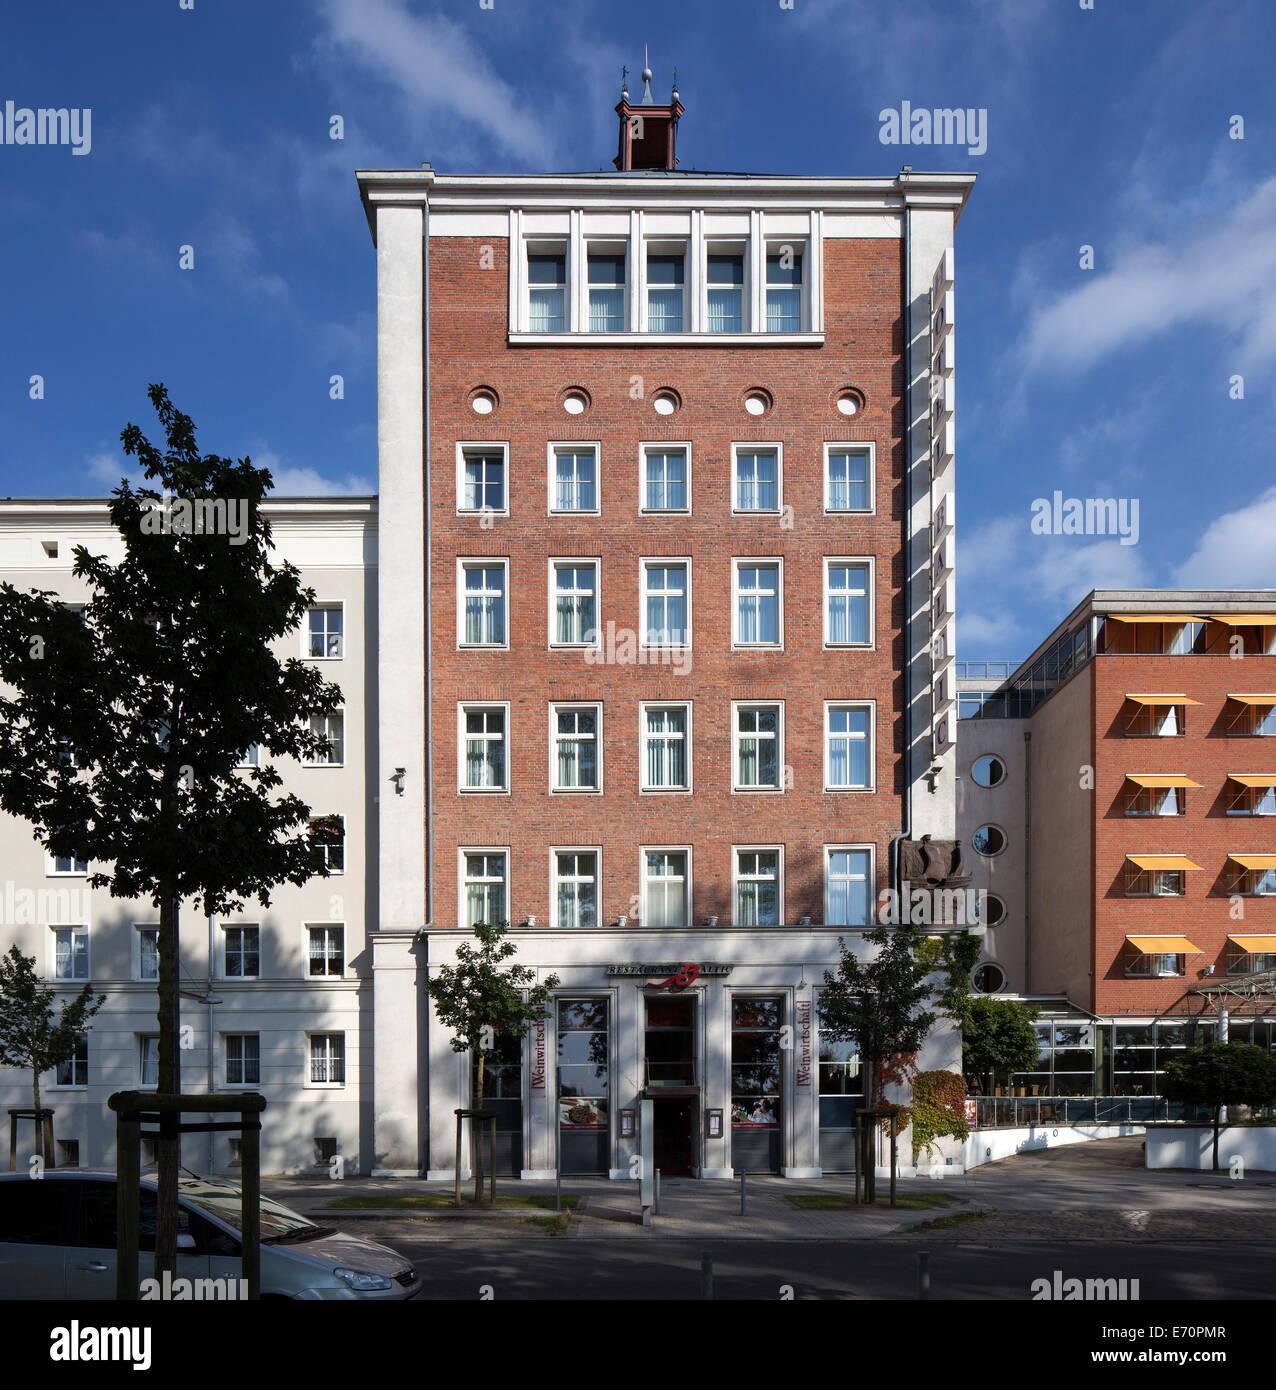 Hotel Arcona Baltic, in the style of socialist modernism, Stralsund, Mecklenburg-Western Pomerania, Germany - Stock Image